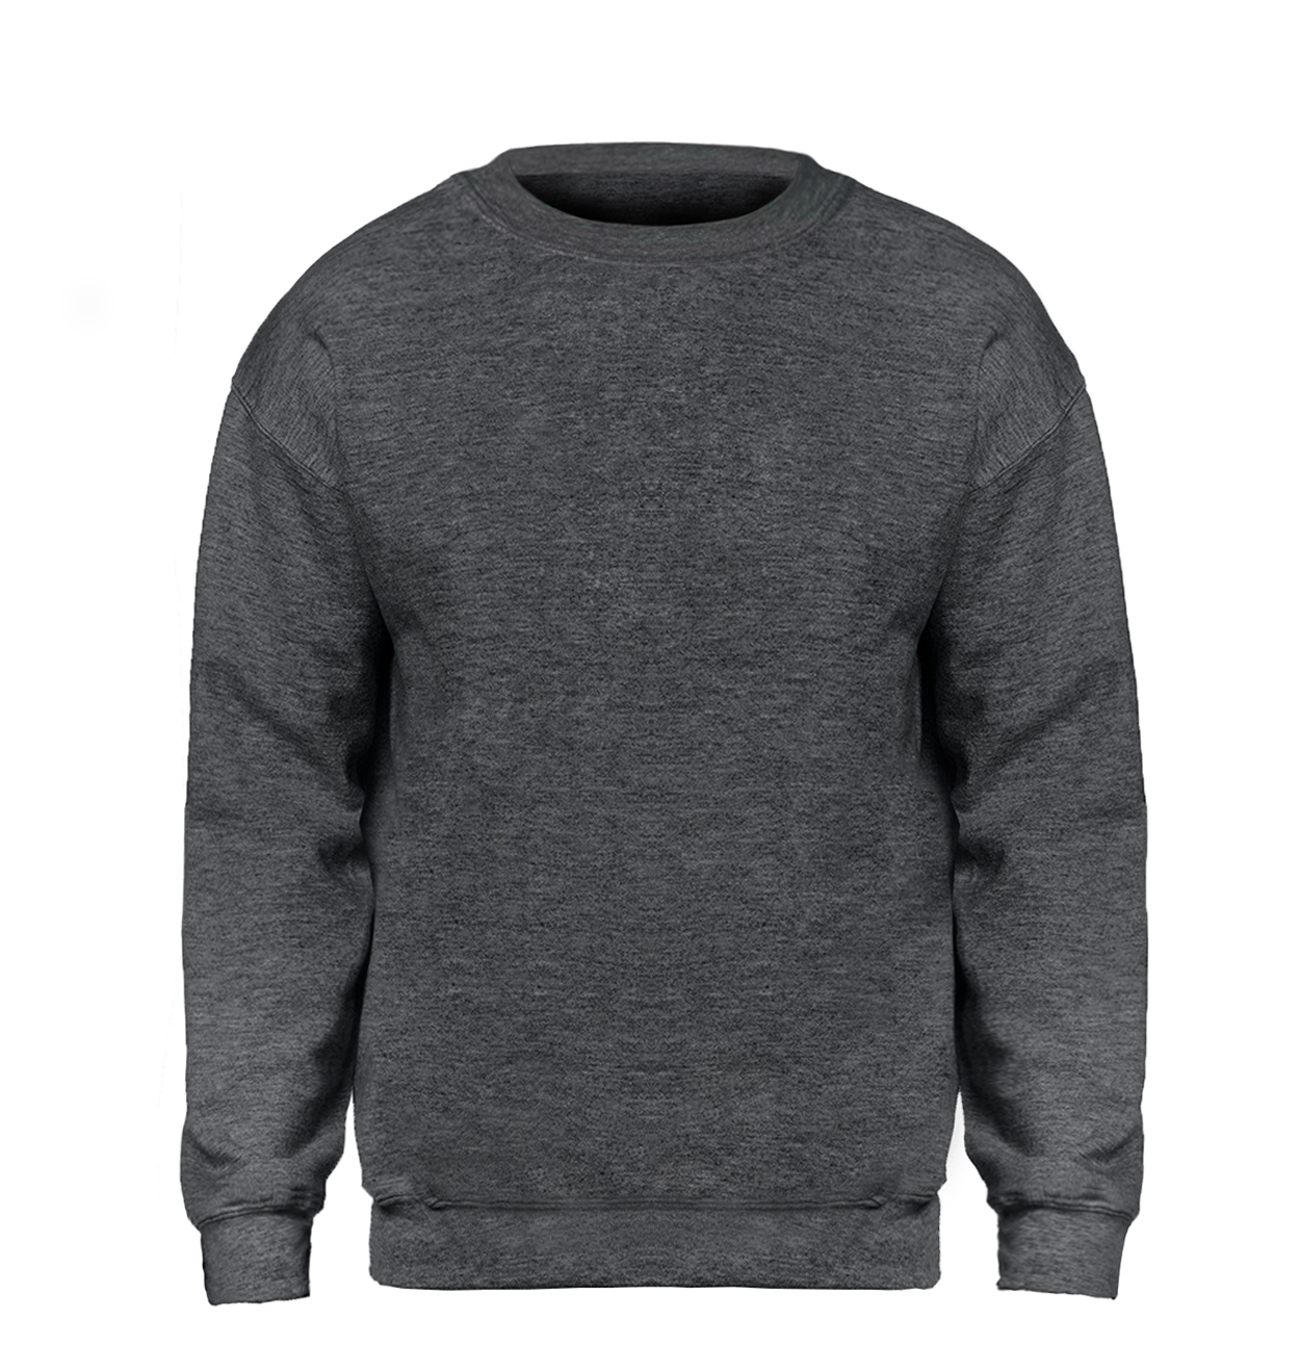 Solid color Sweatshirt Men Hoodie Crewneck Sweatshirts Winter Autumn Fleece Hoody Casual Gray Blue Red Black White Streetwear 11